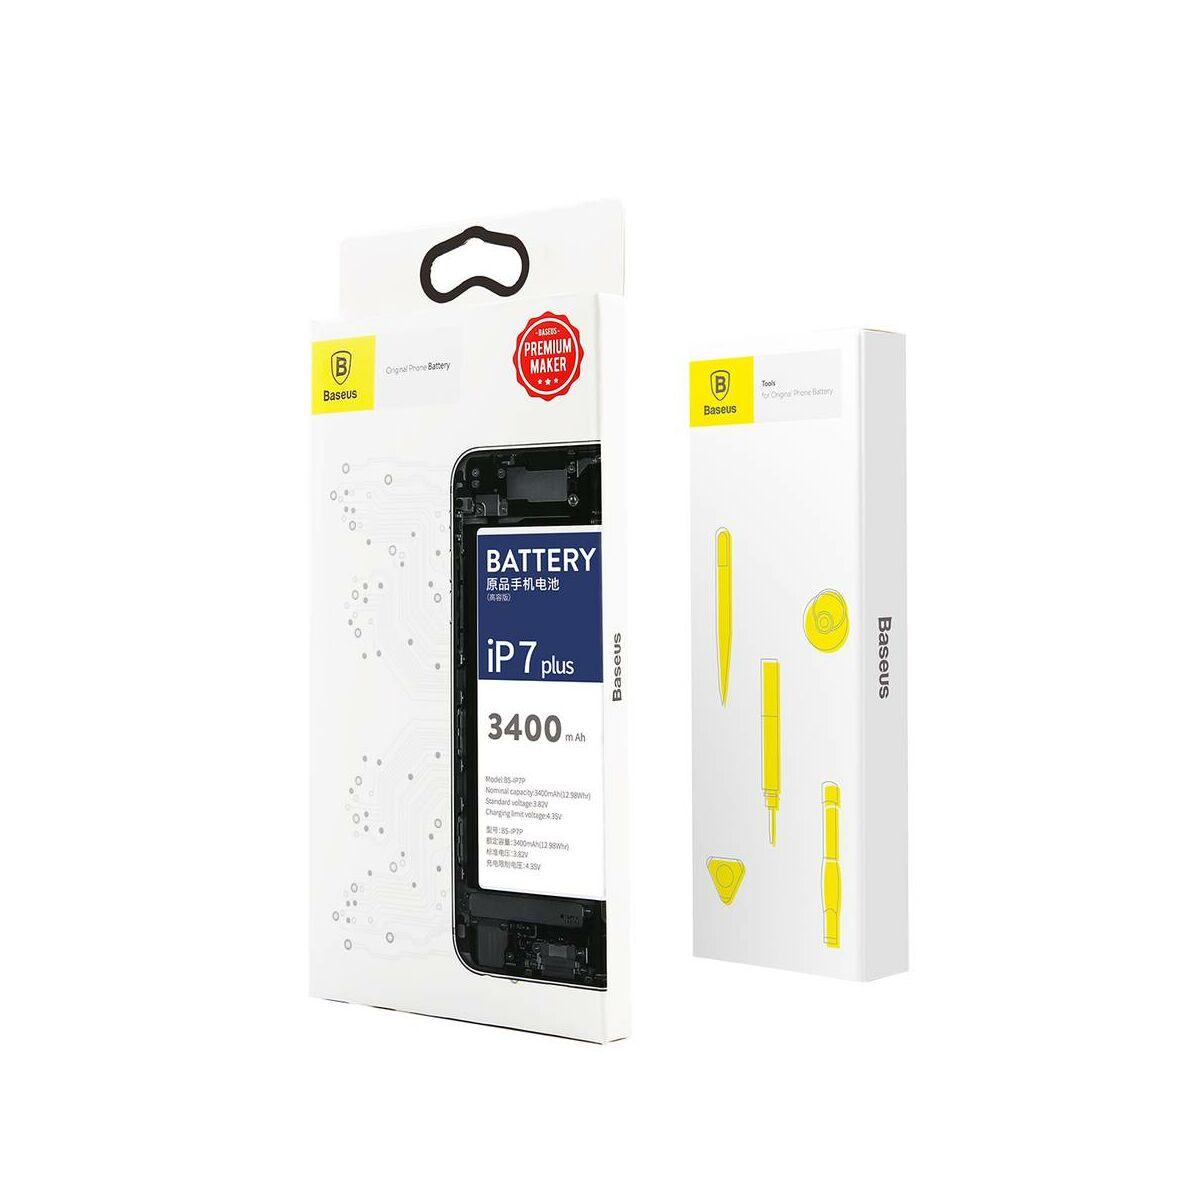 Baseus nagy teljesítményű akkumulátor iPhone 7 plus-hoz, 3400 mAh (ACCB-BIP7P)